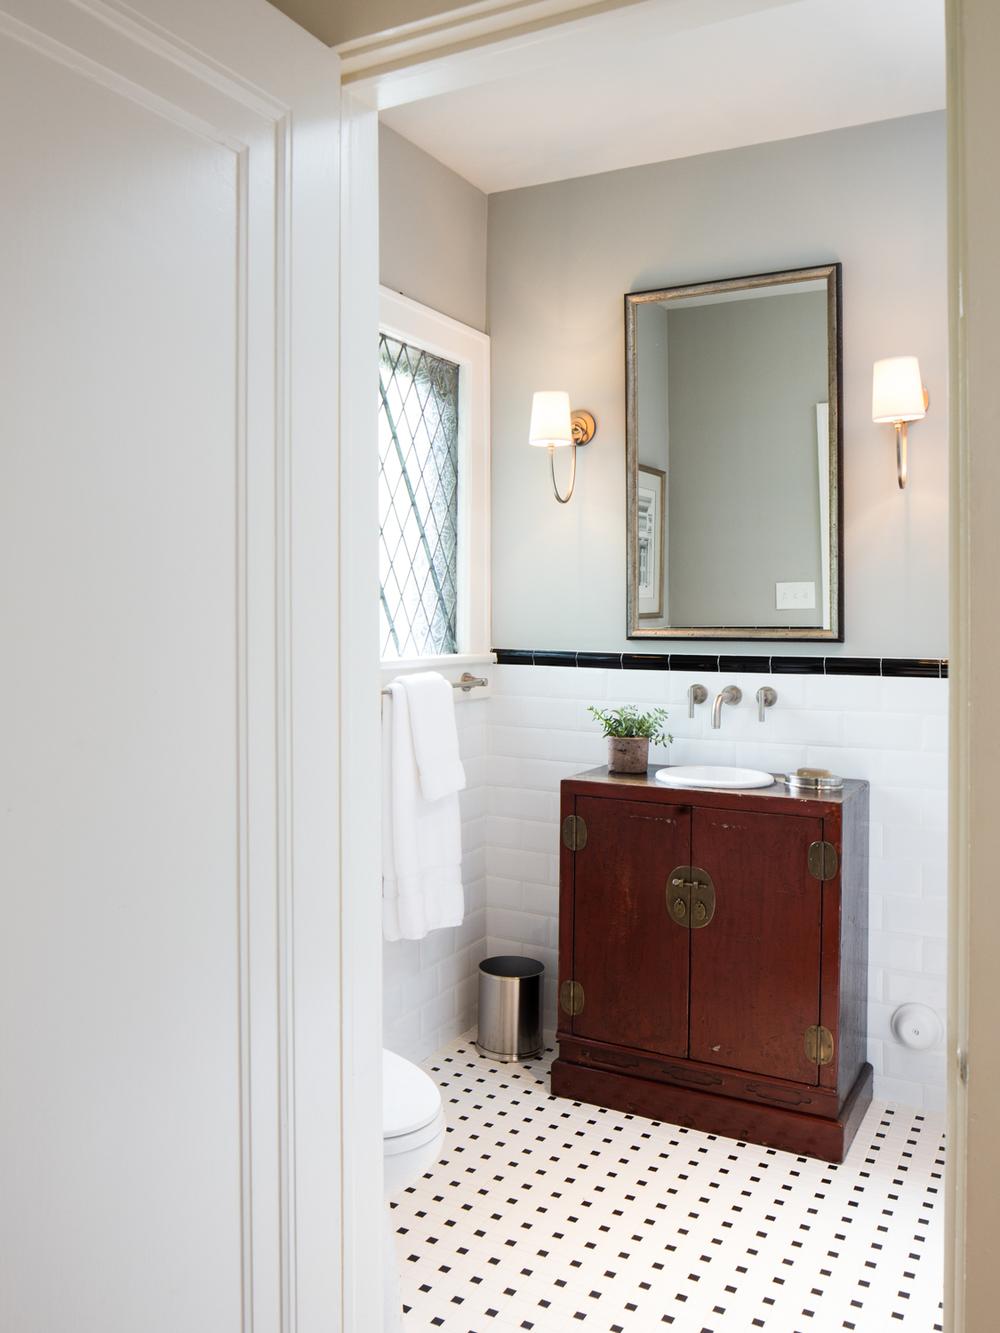 819 Conroy Rd - Birmingham AL Real Estate Photography3439.jpg